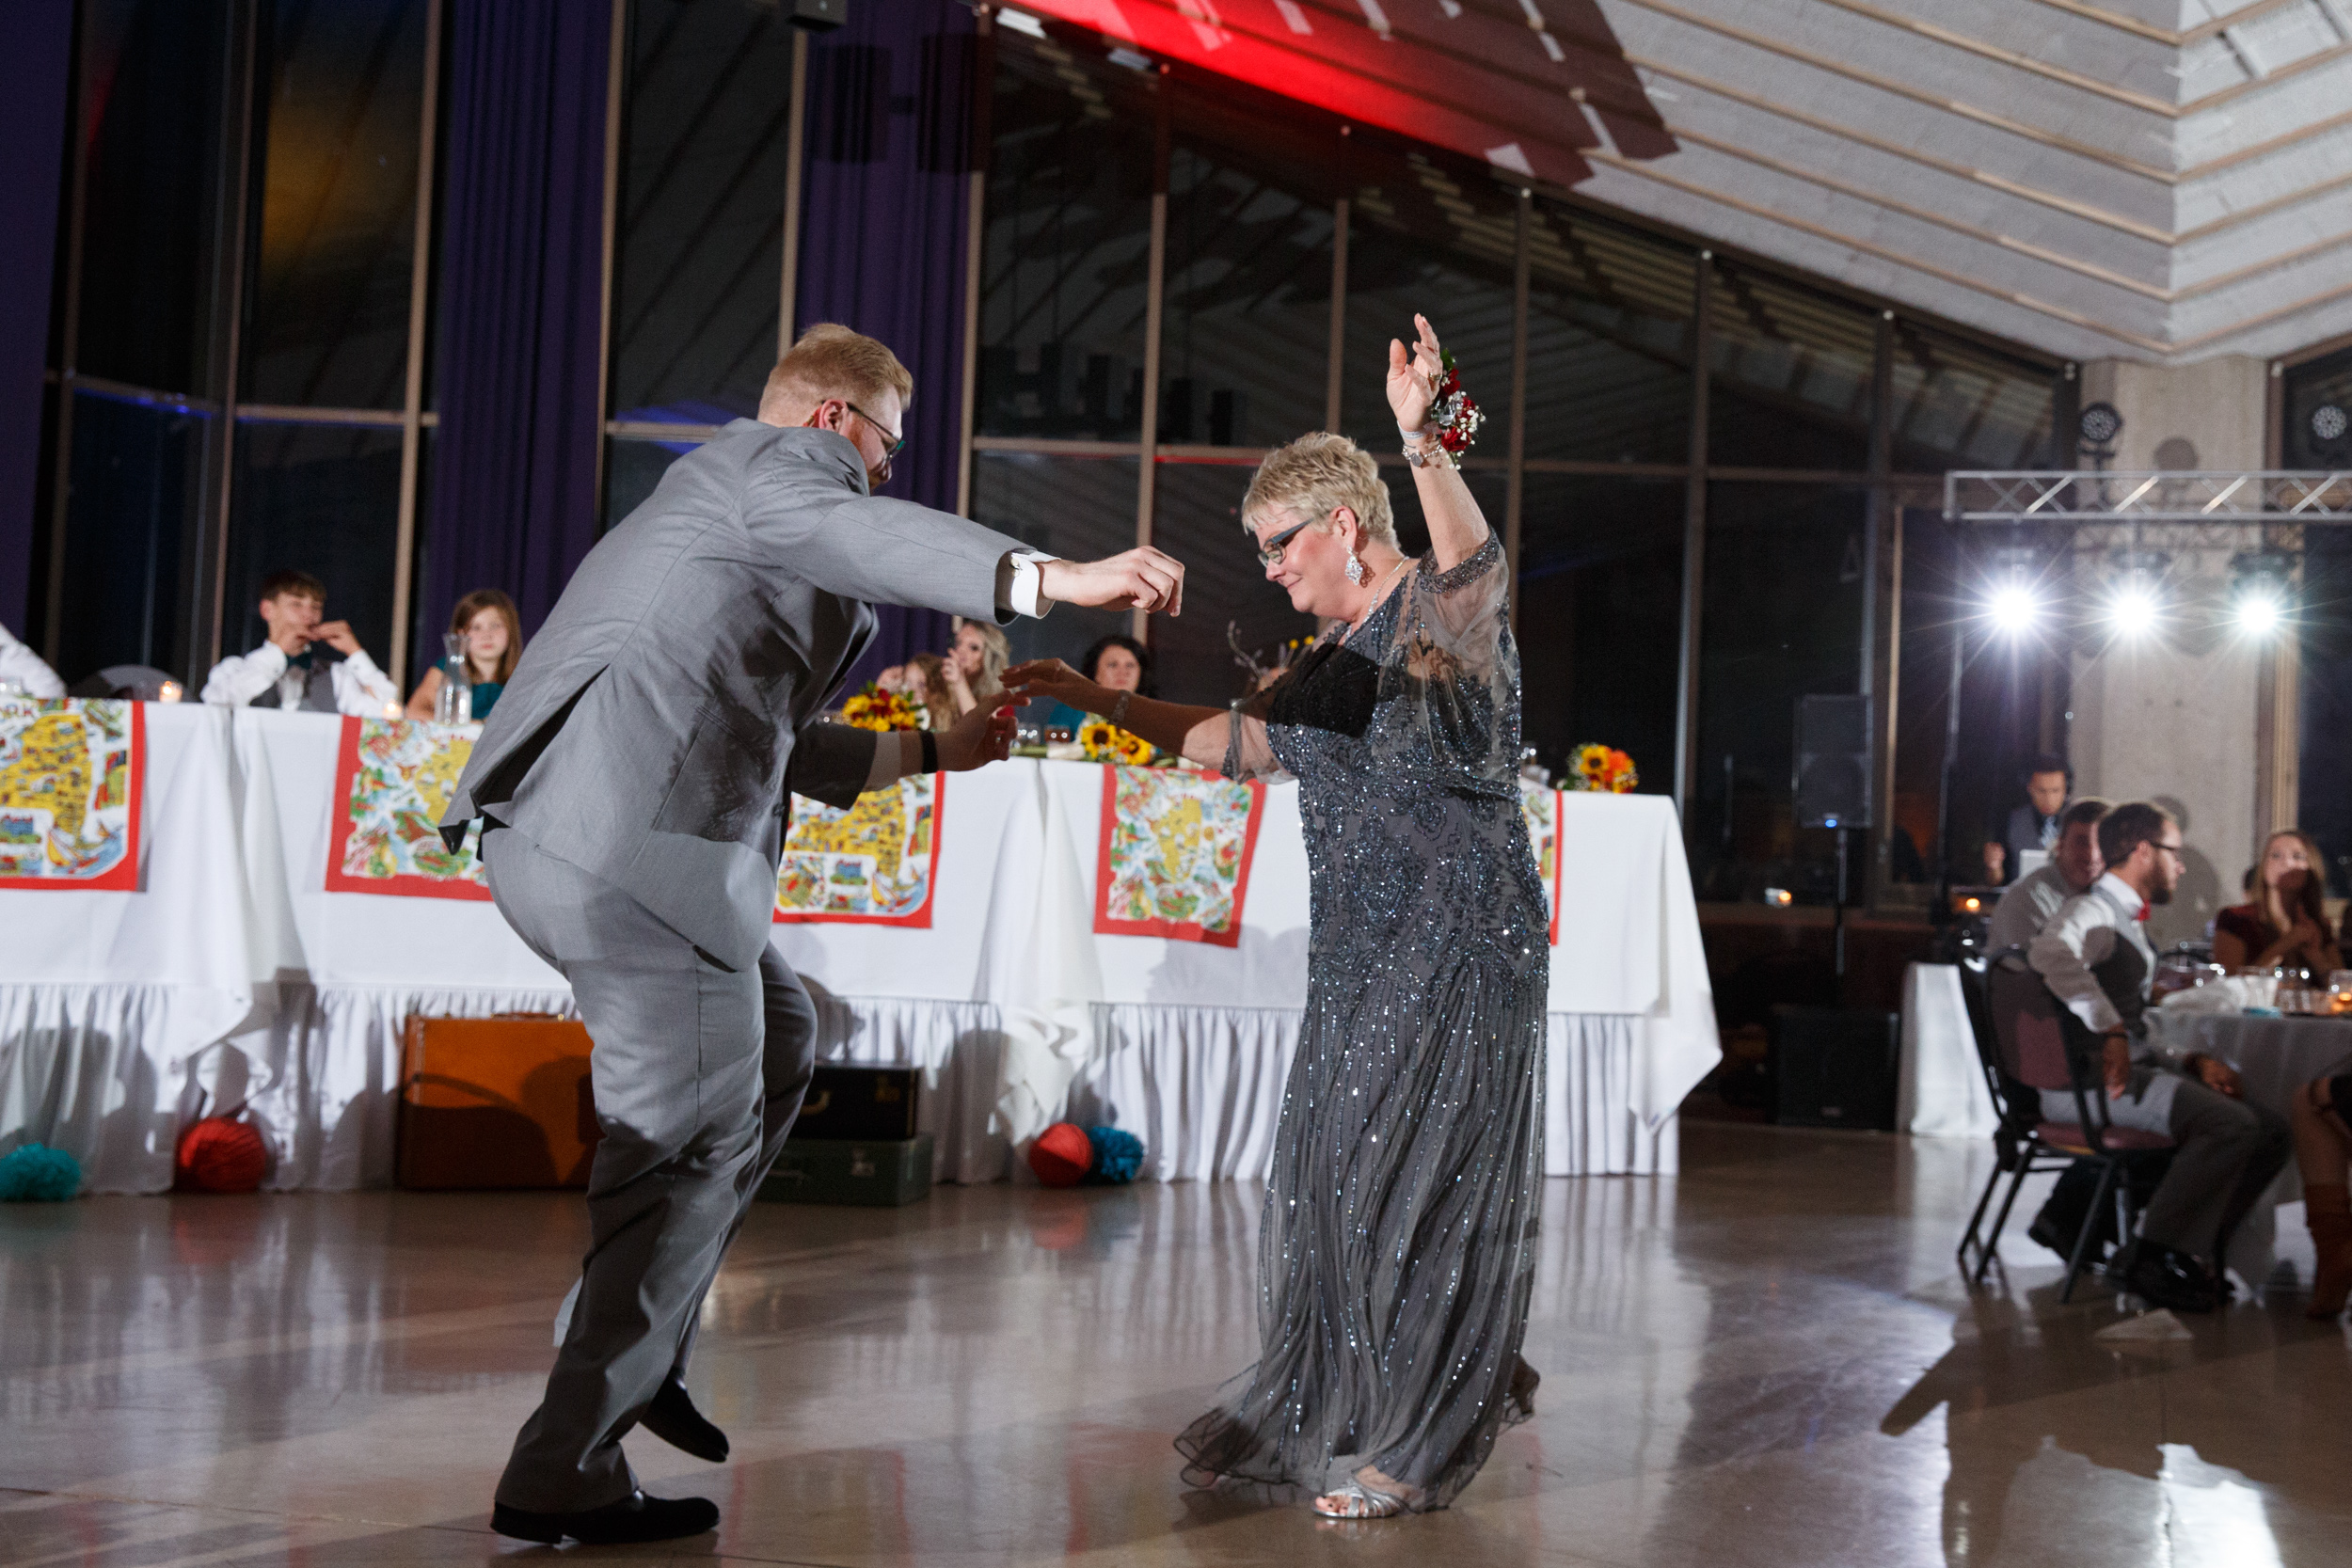 Christian & Sarah wedding photography by Brian milo-248.jpg